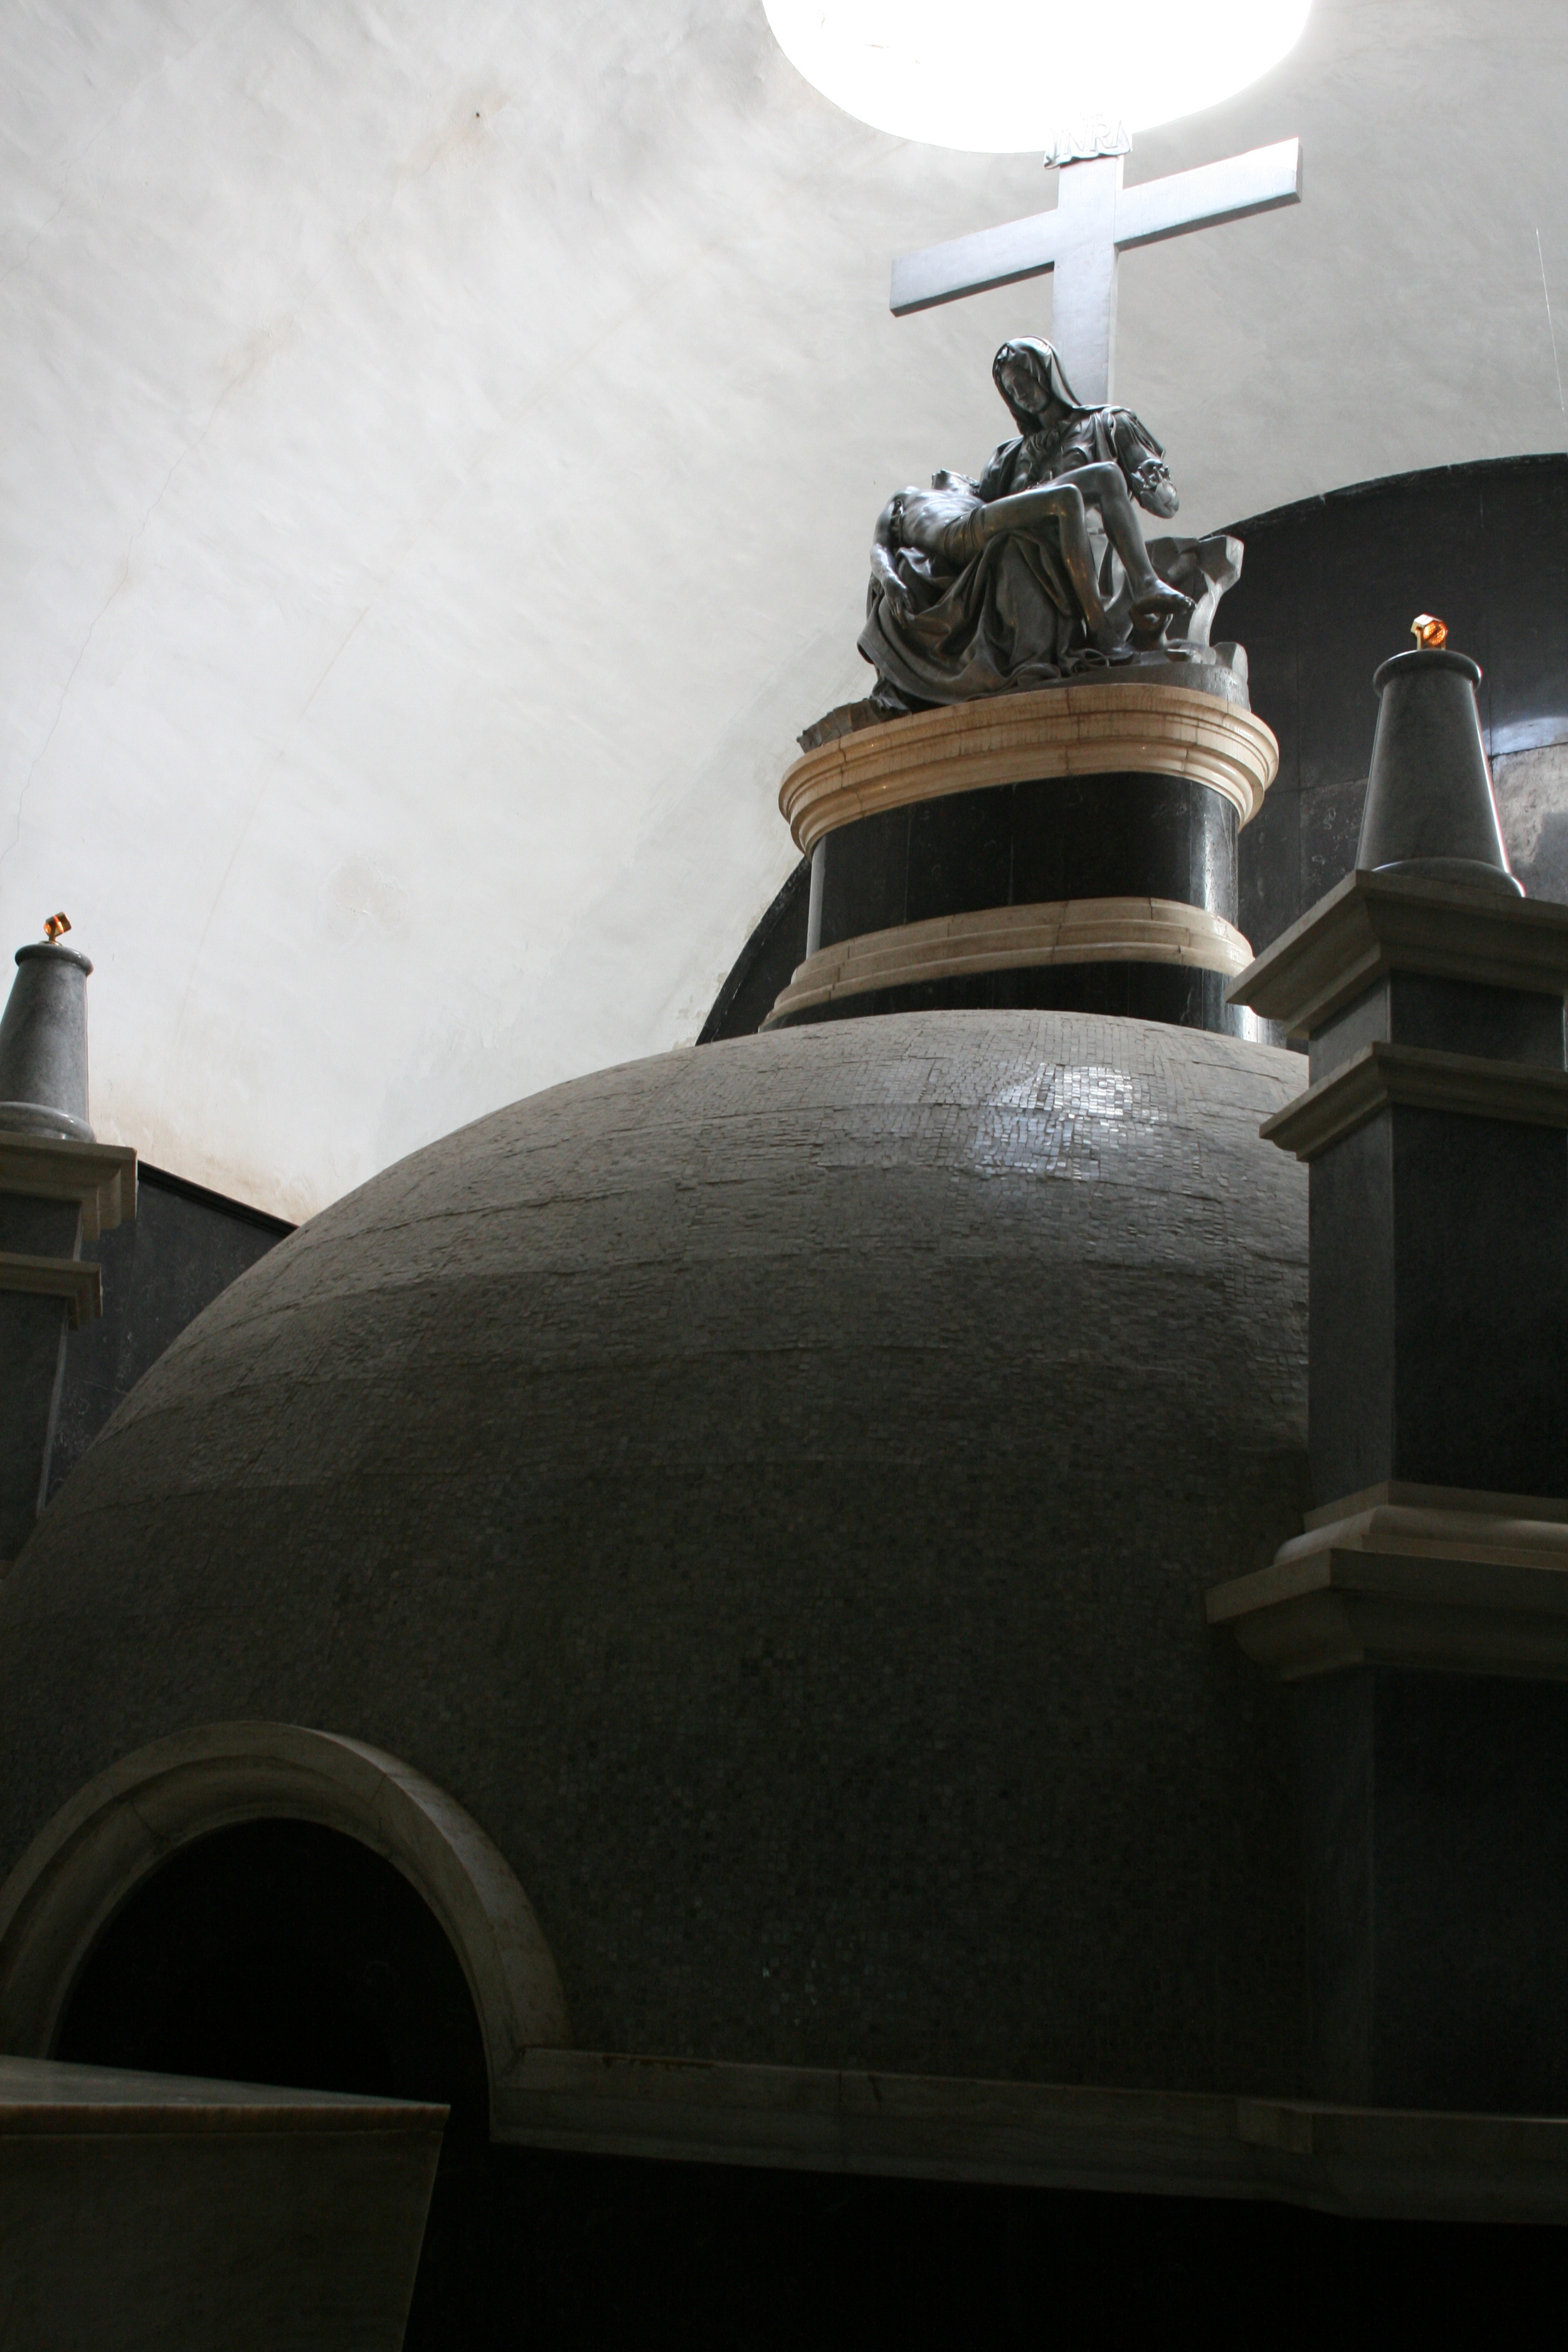 An aluminum replica of Michelangelo's Pietà over the tomb.